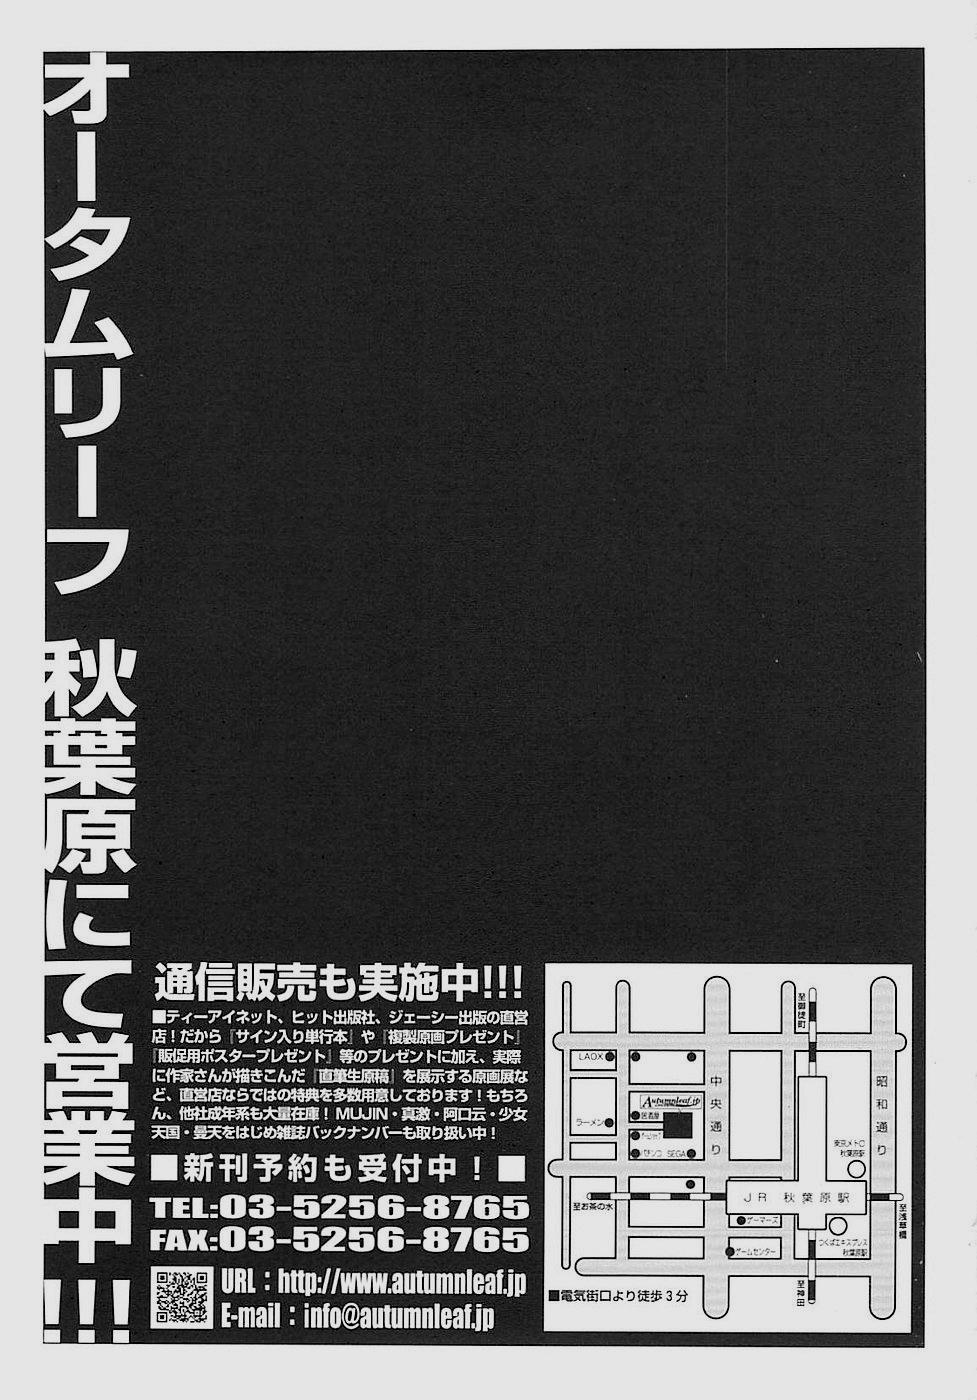 Inkoukamitsu 198